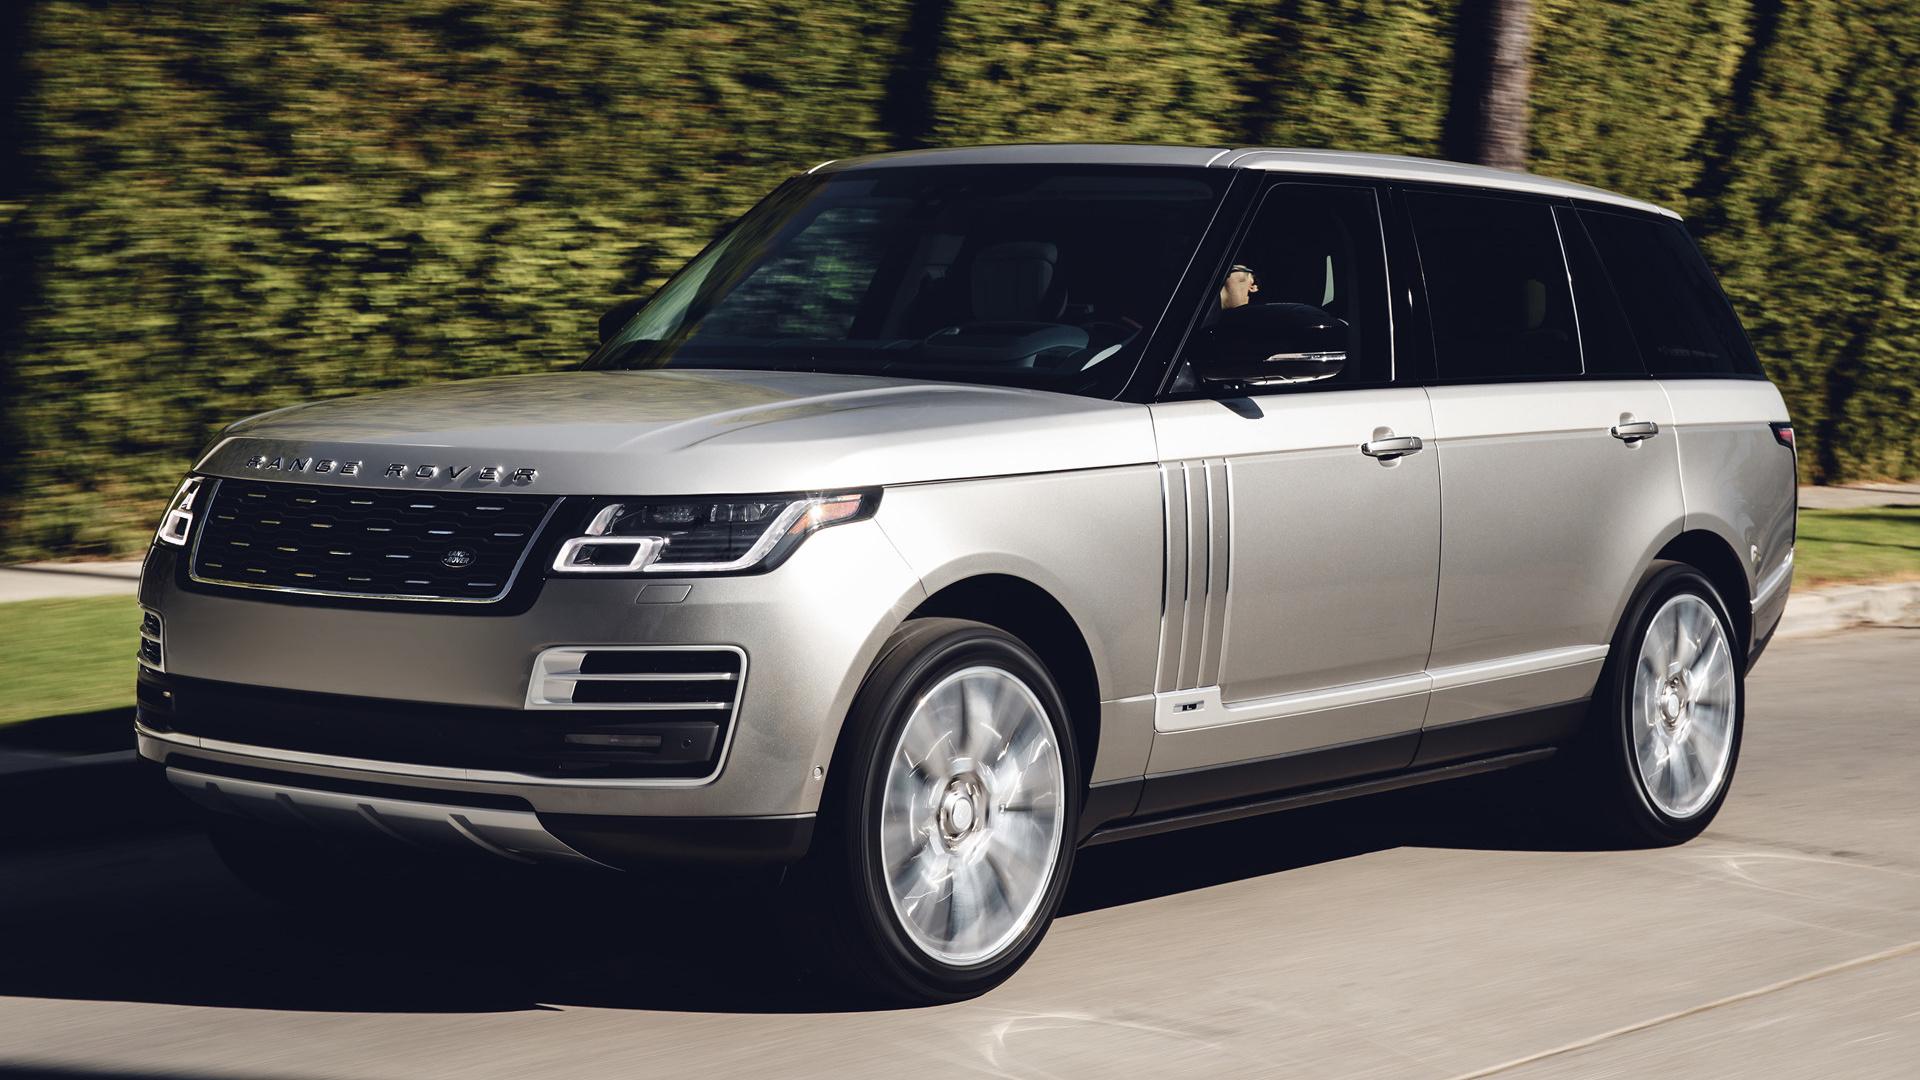 Range Rover Autobiography >> 2018 Range Rover SVAutobiography [LWB] (US) - Wallpapers ...